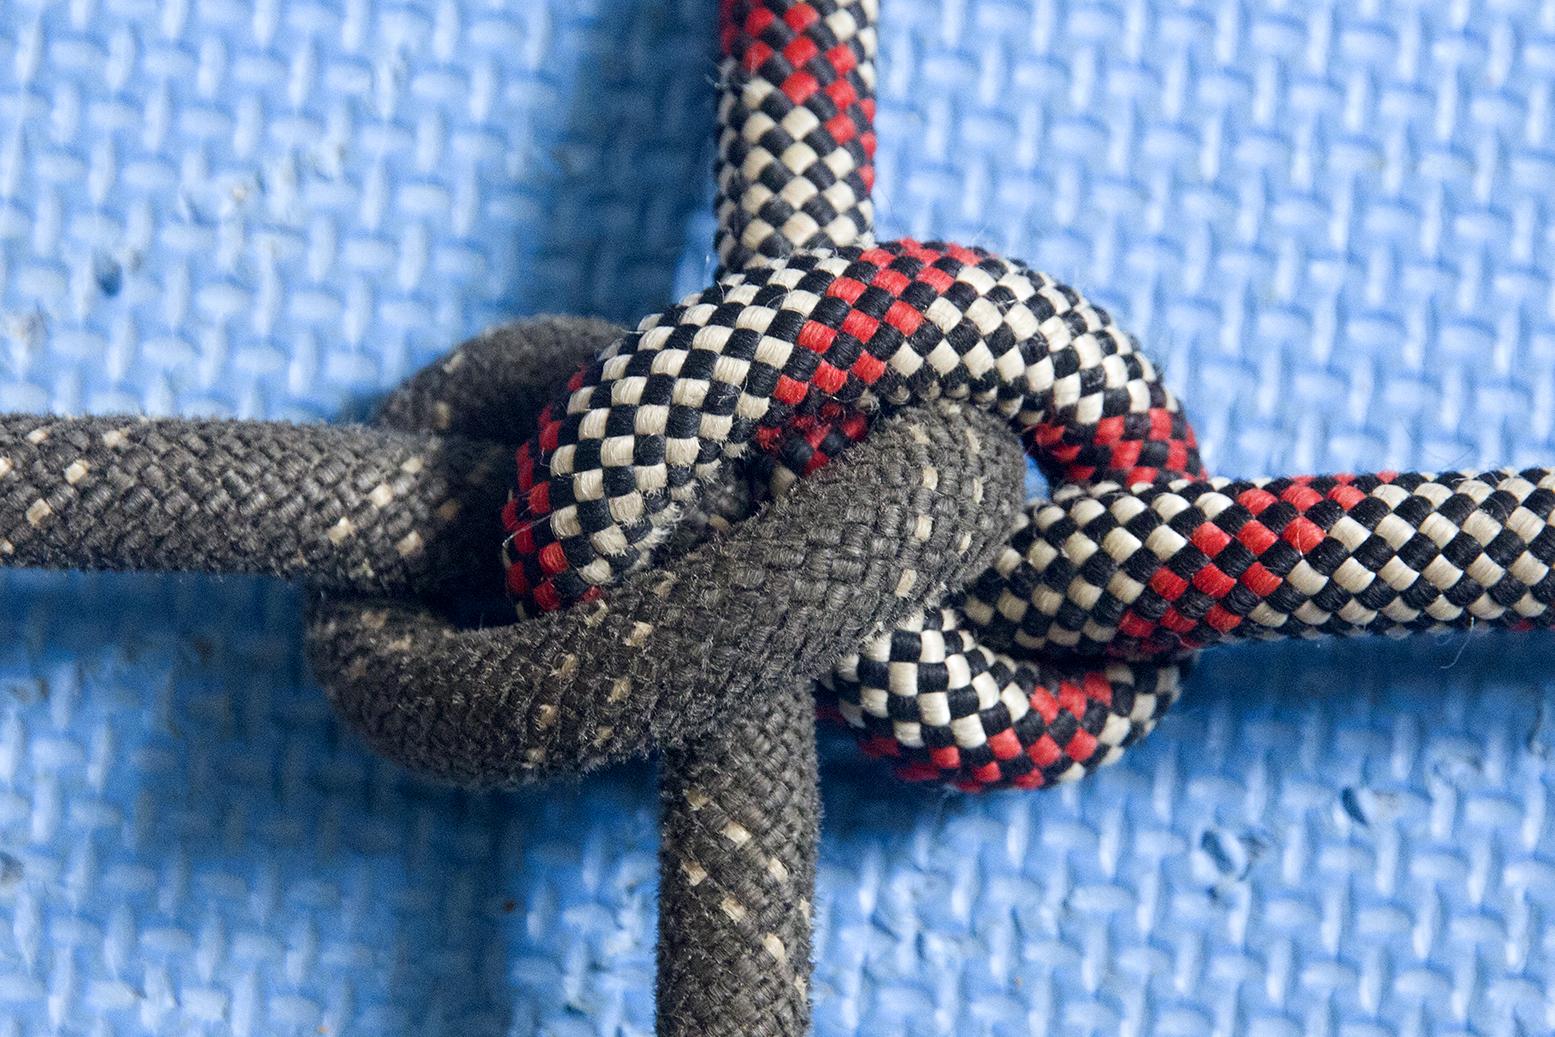 Шлямбурный скальный крюк. шлямбуры для альпинизма